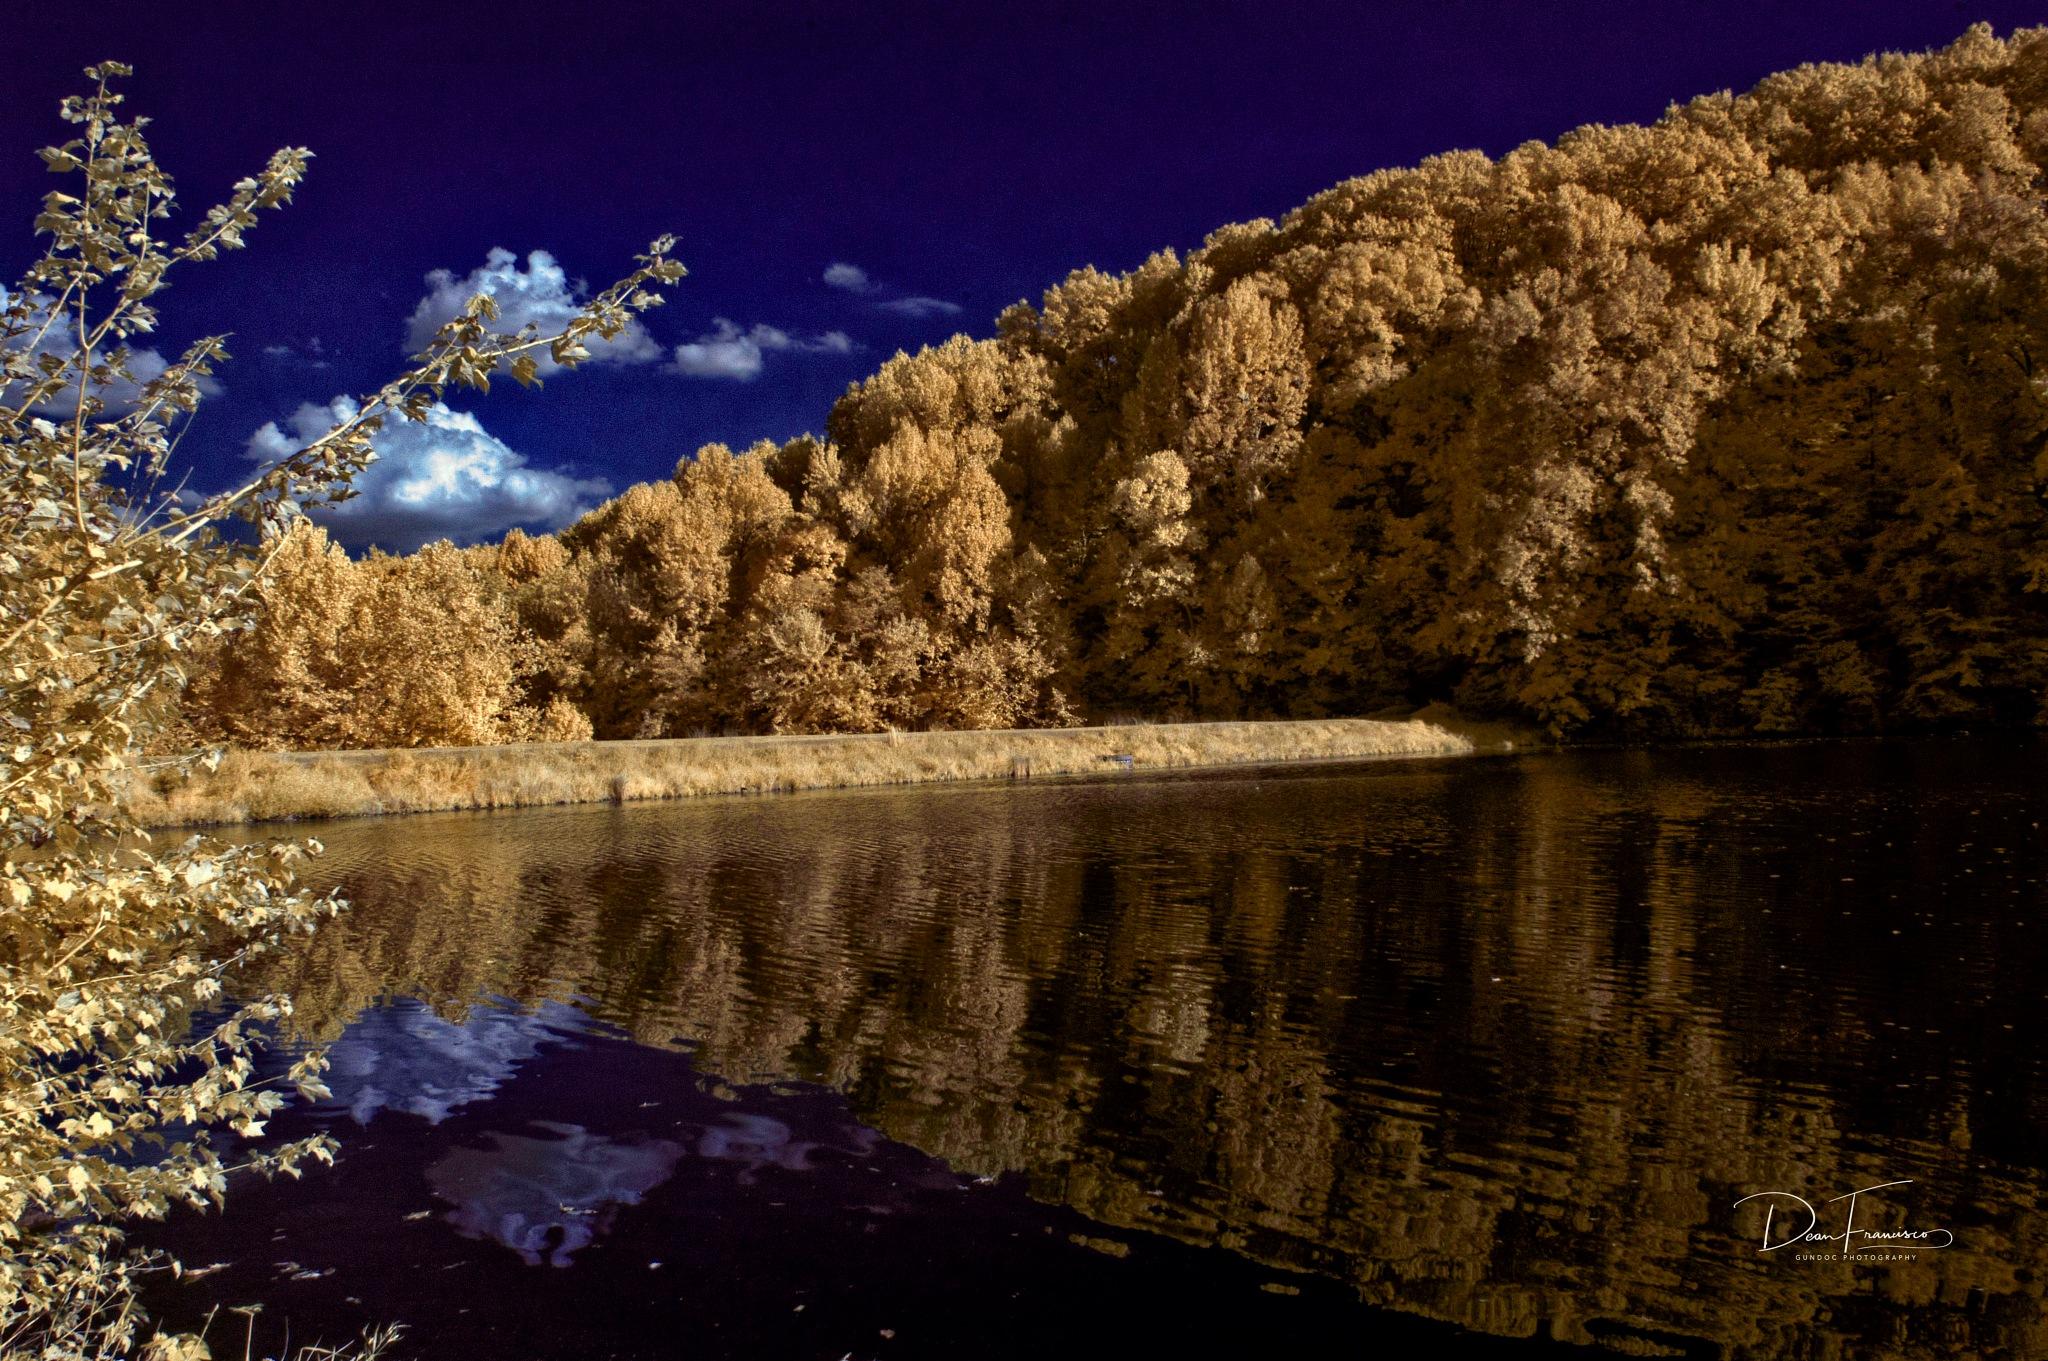 Tom Wallace Lake Dam in IR by Dean Francisco